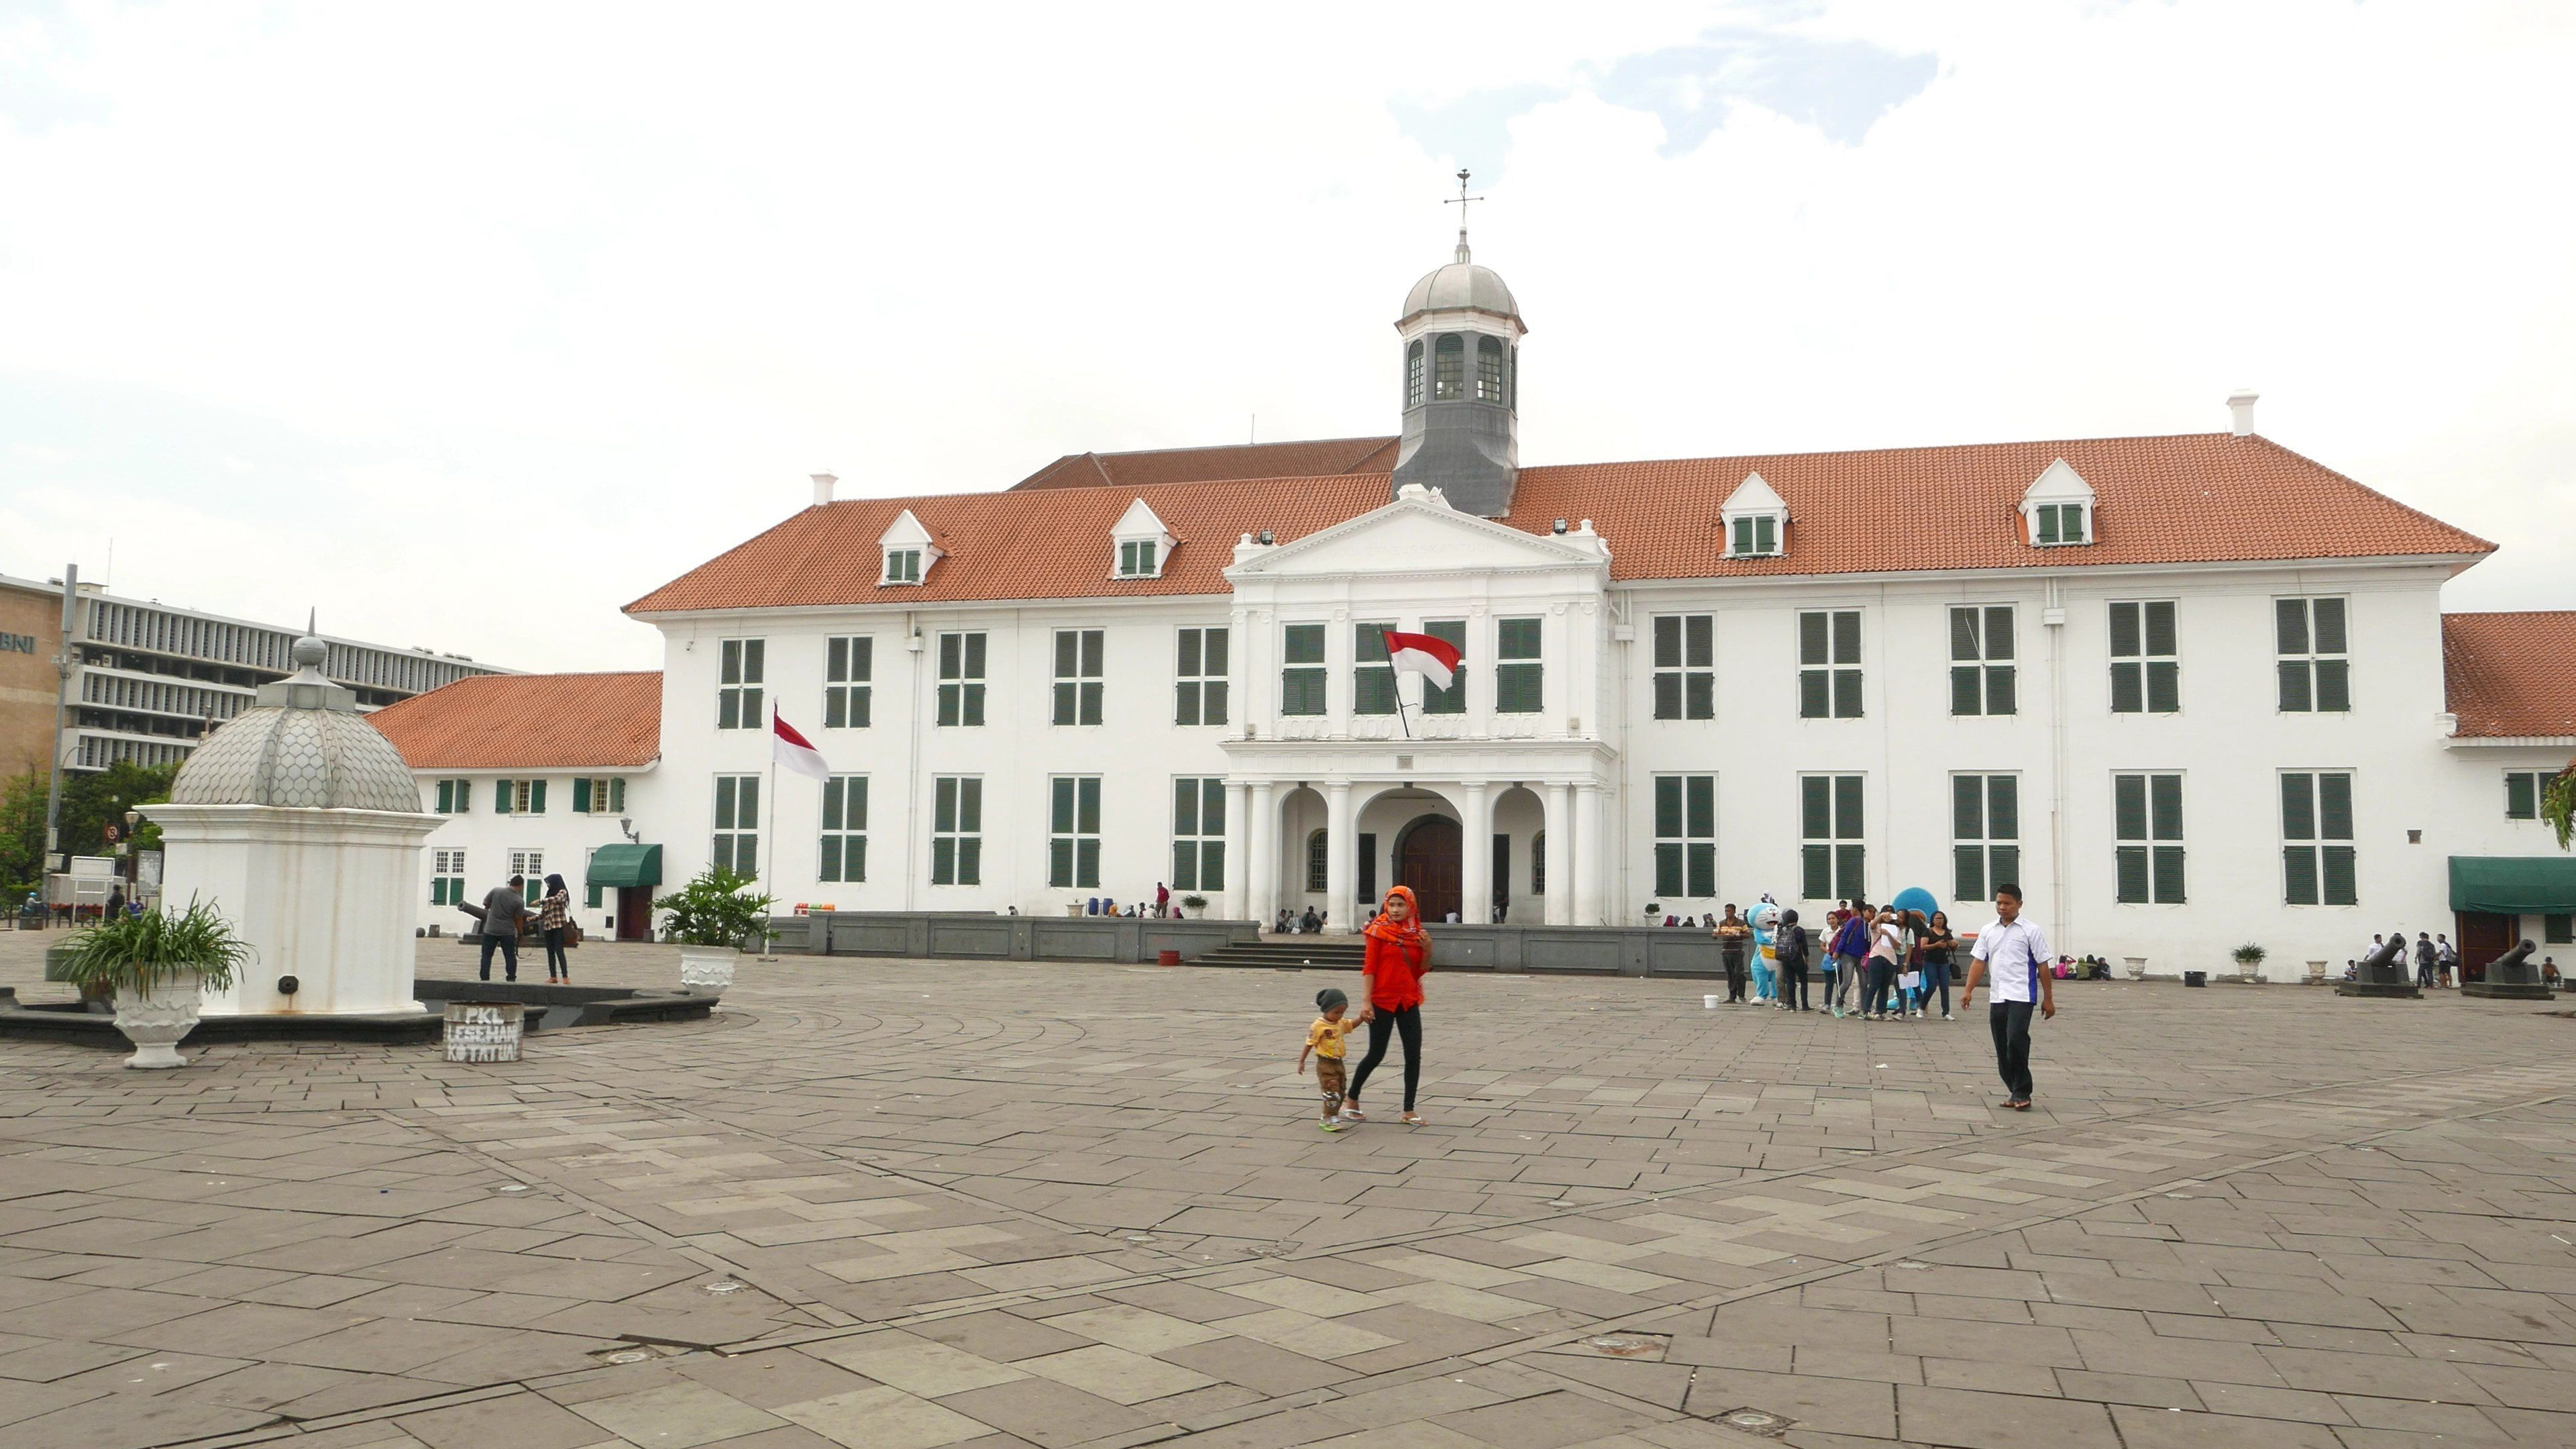 Tur Pribadi Berpemandu Sehari Penuh di Kota Tua Jakarta dengan Makan Siang